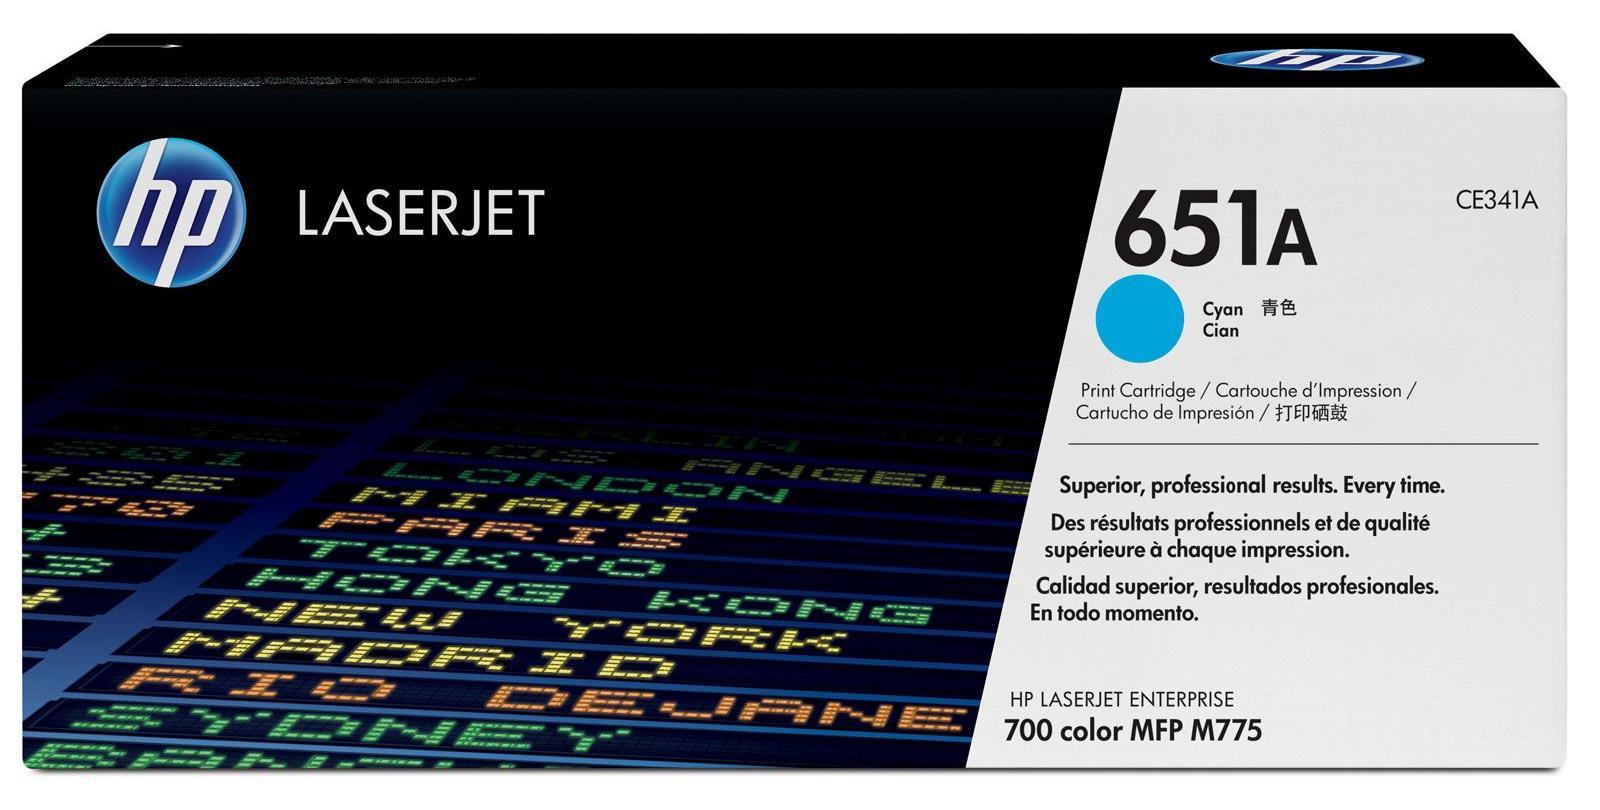 HP 651A (CE341A) - картридж для принтера HP LaserJet (Cyan)